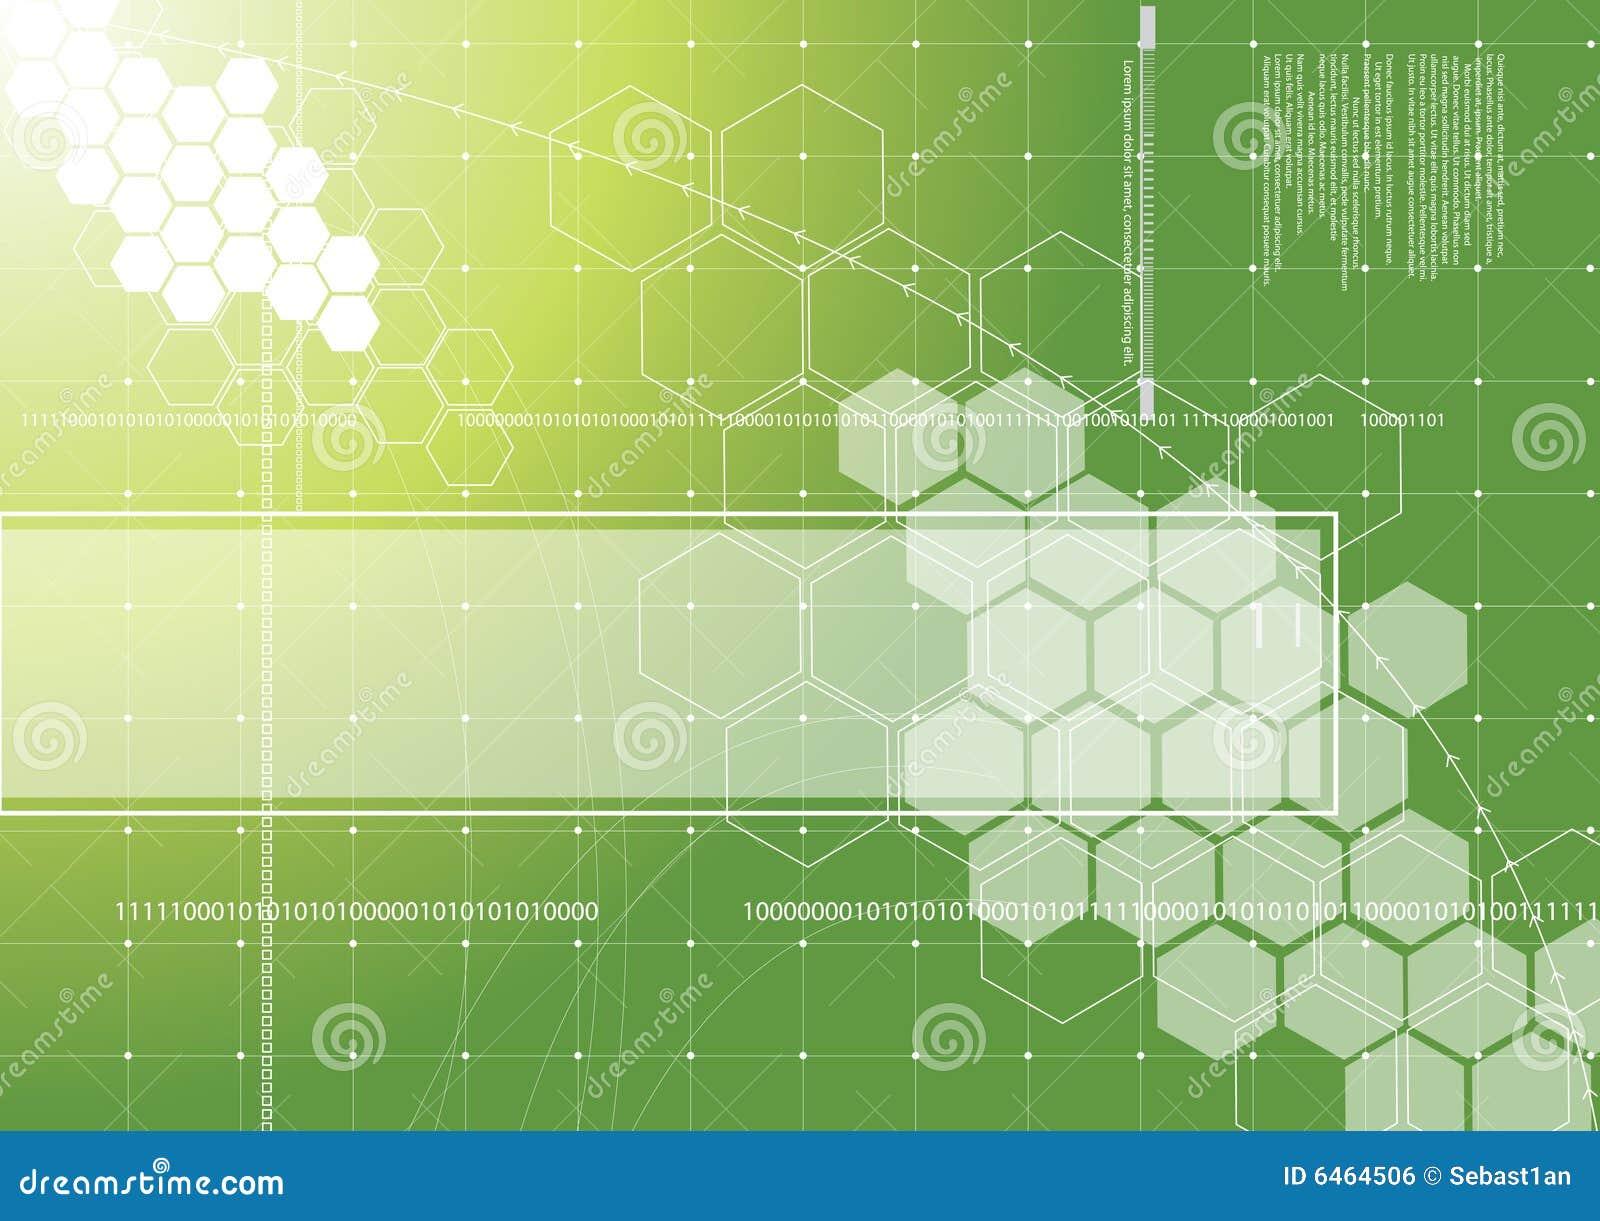 Glossy Tabs For Website Navigation Stock Vector Illustration Of